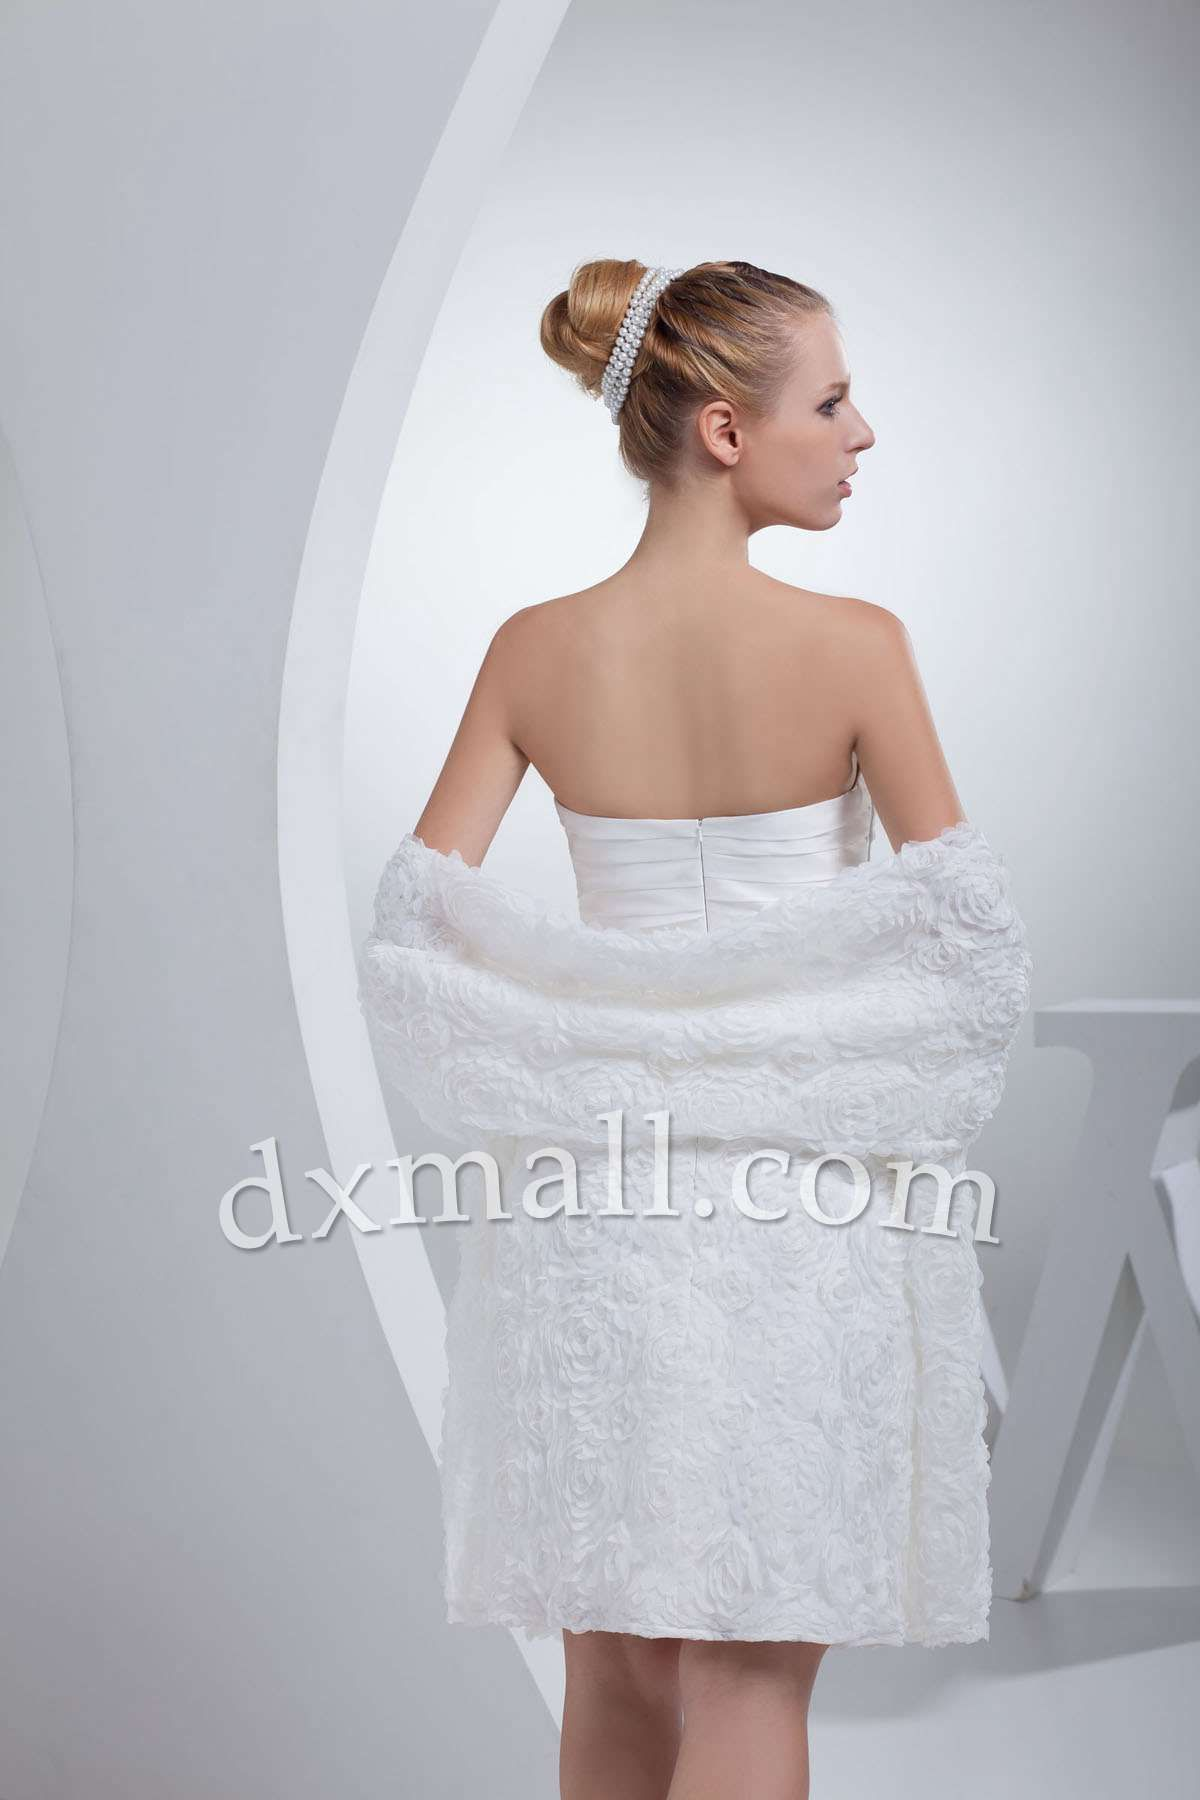 Aline Wedding Dresses Strapless ShortMini Lace Taffeta White